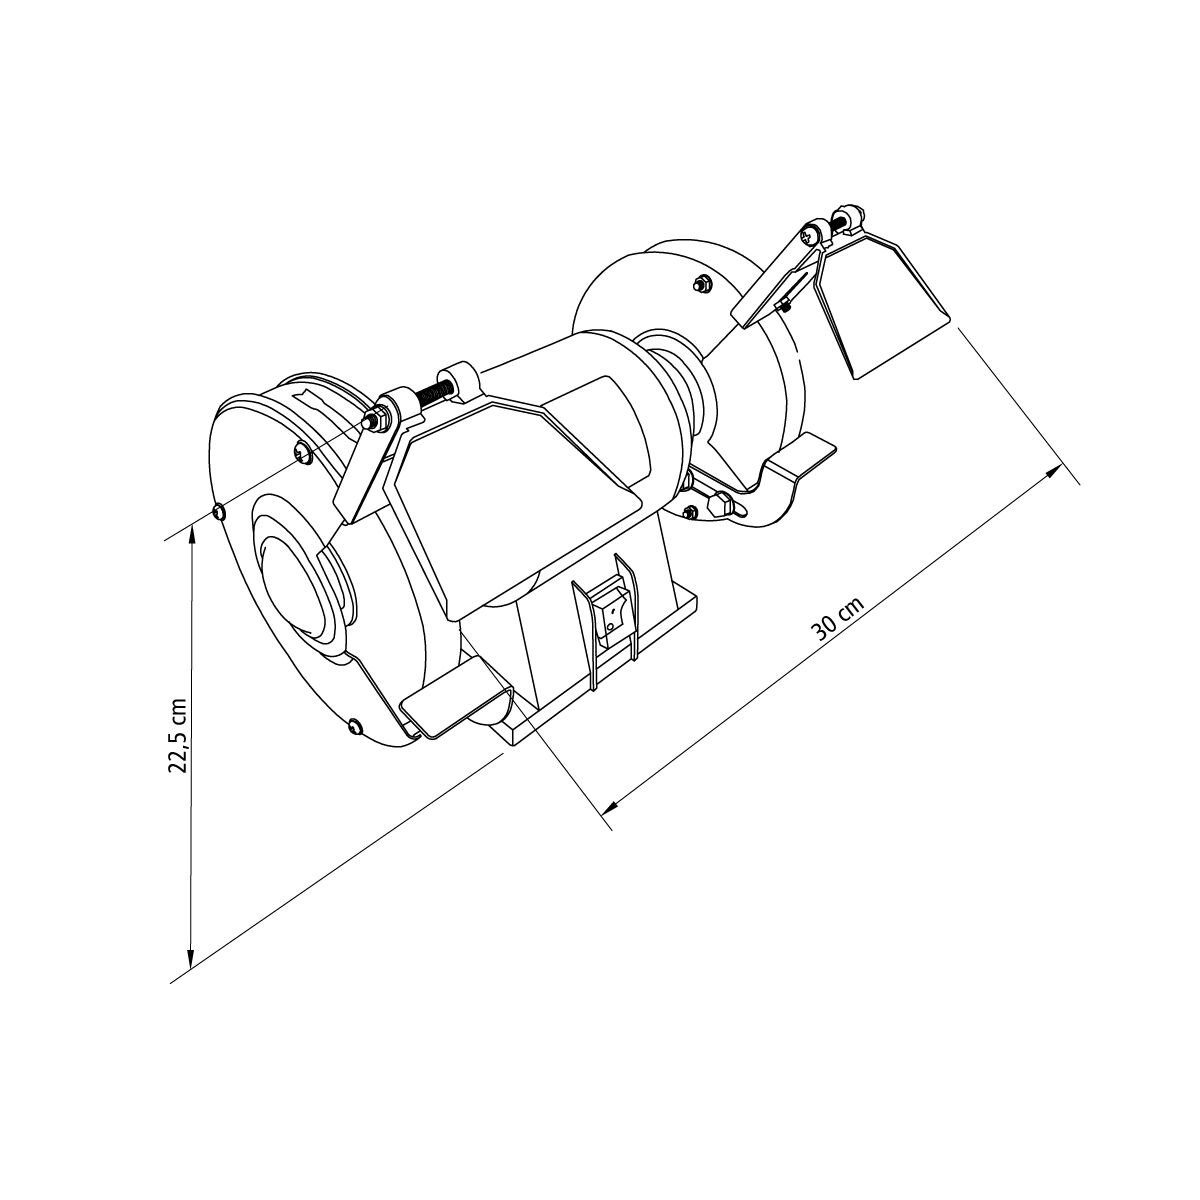 Tramontina 260 W Bivolt 5 Bench Grinder Professional Use. Dimens Es. Wiring. Br Tool Bench Grinder Wiring Diagram At Scoala.co